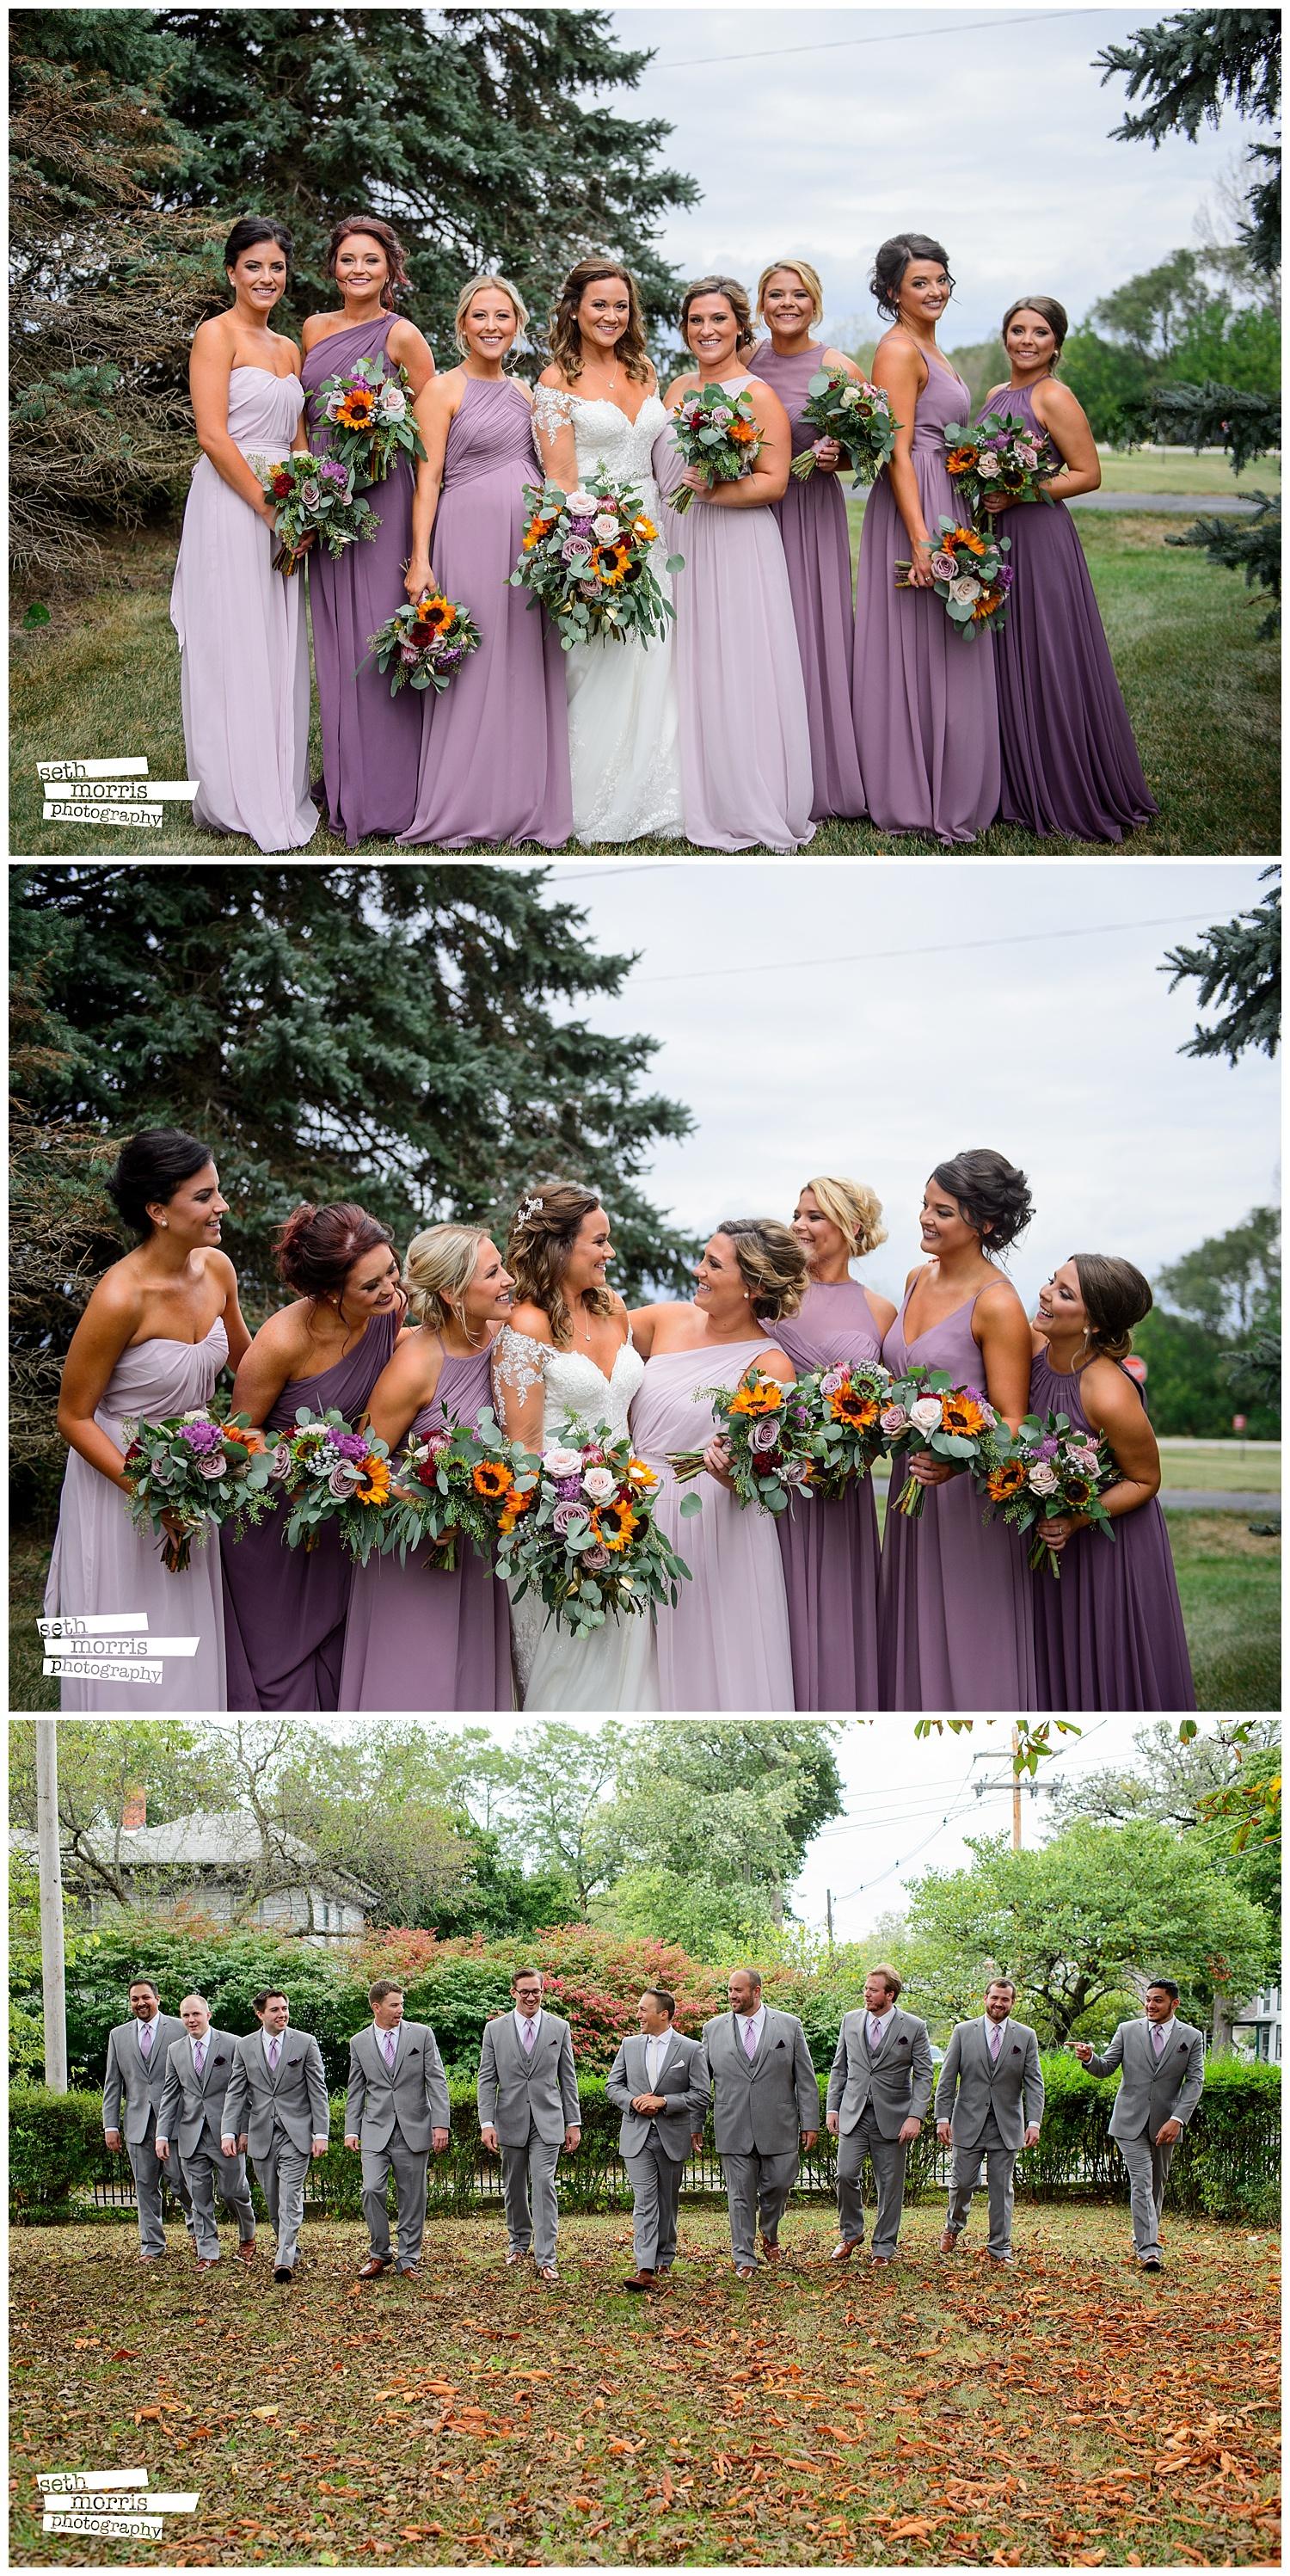 ottawa-tent-wedding-reception-rainy wedding-pictures-24.jpg